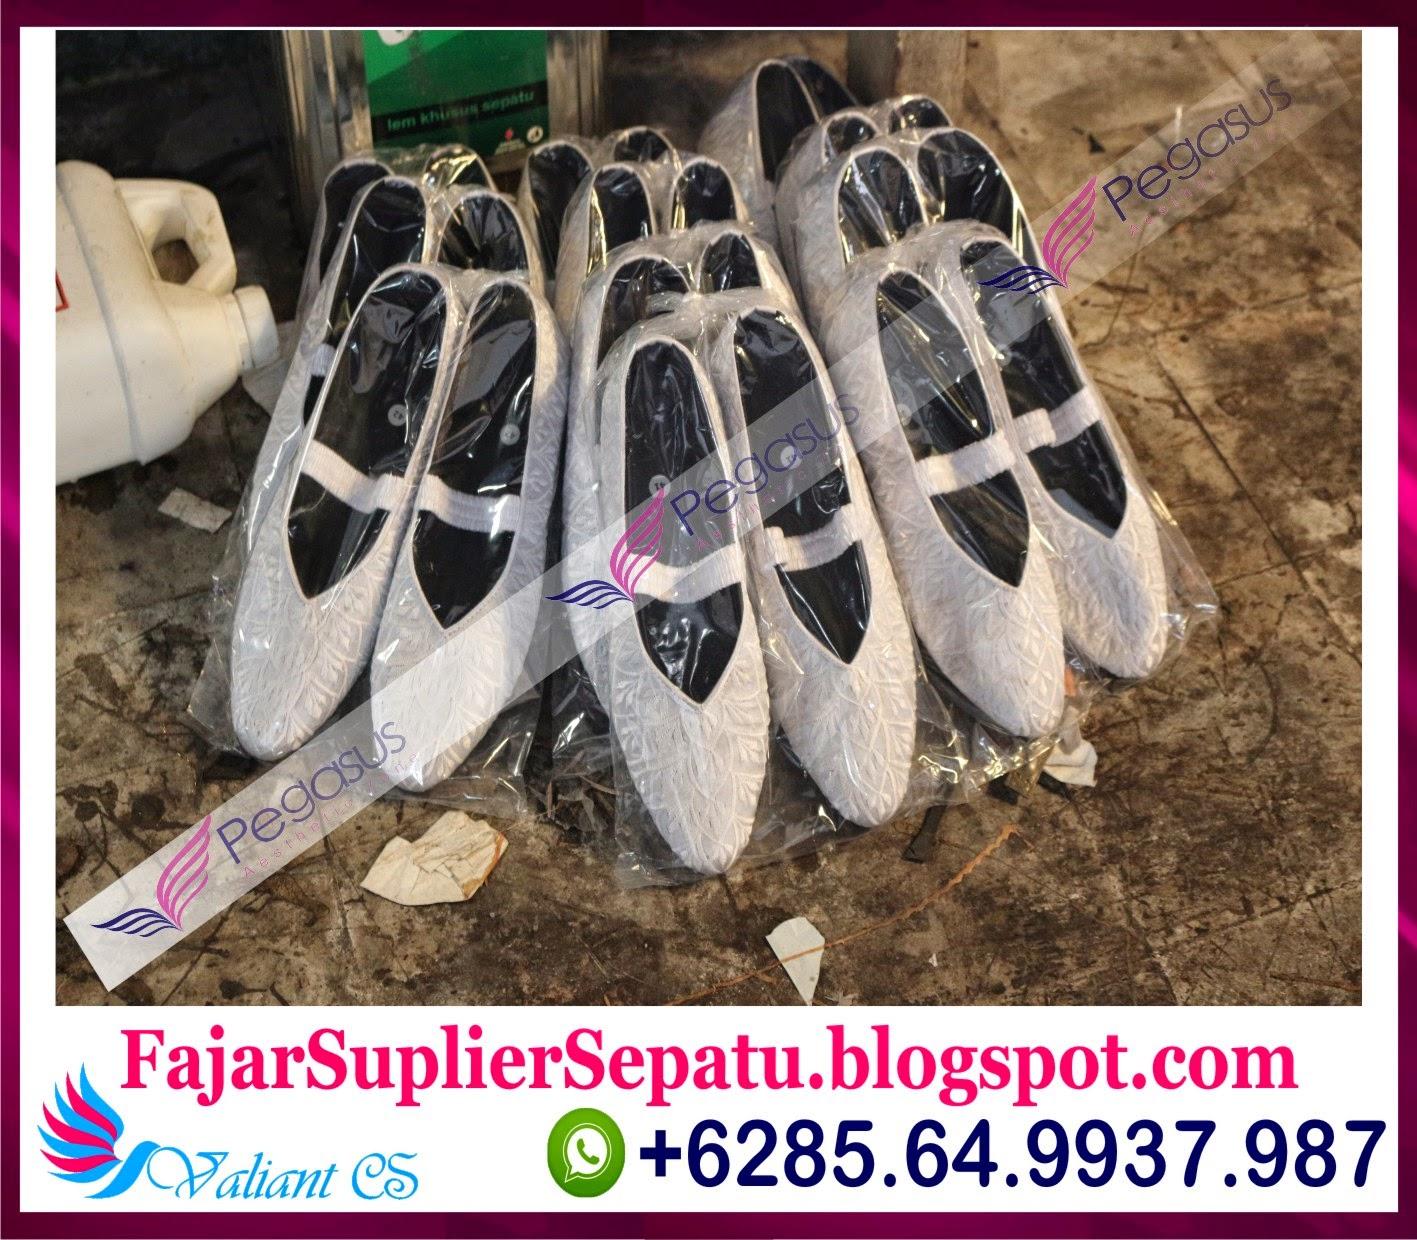 Sepatu Bordir Murah, Grosir Sepatu Murah, Grosir Sepatu Wanita, +62.8564.993.7987